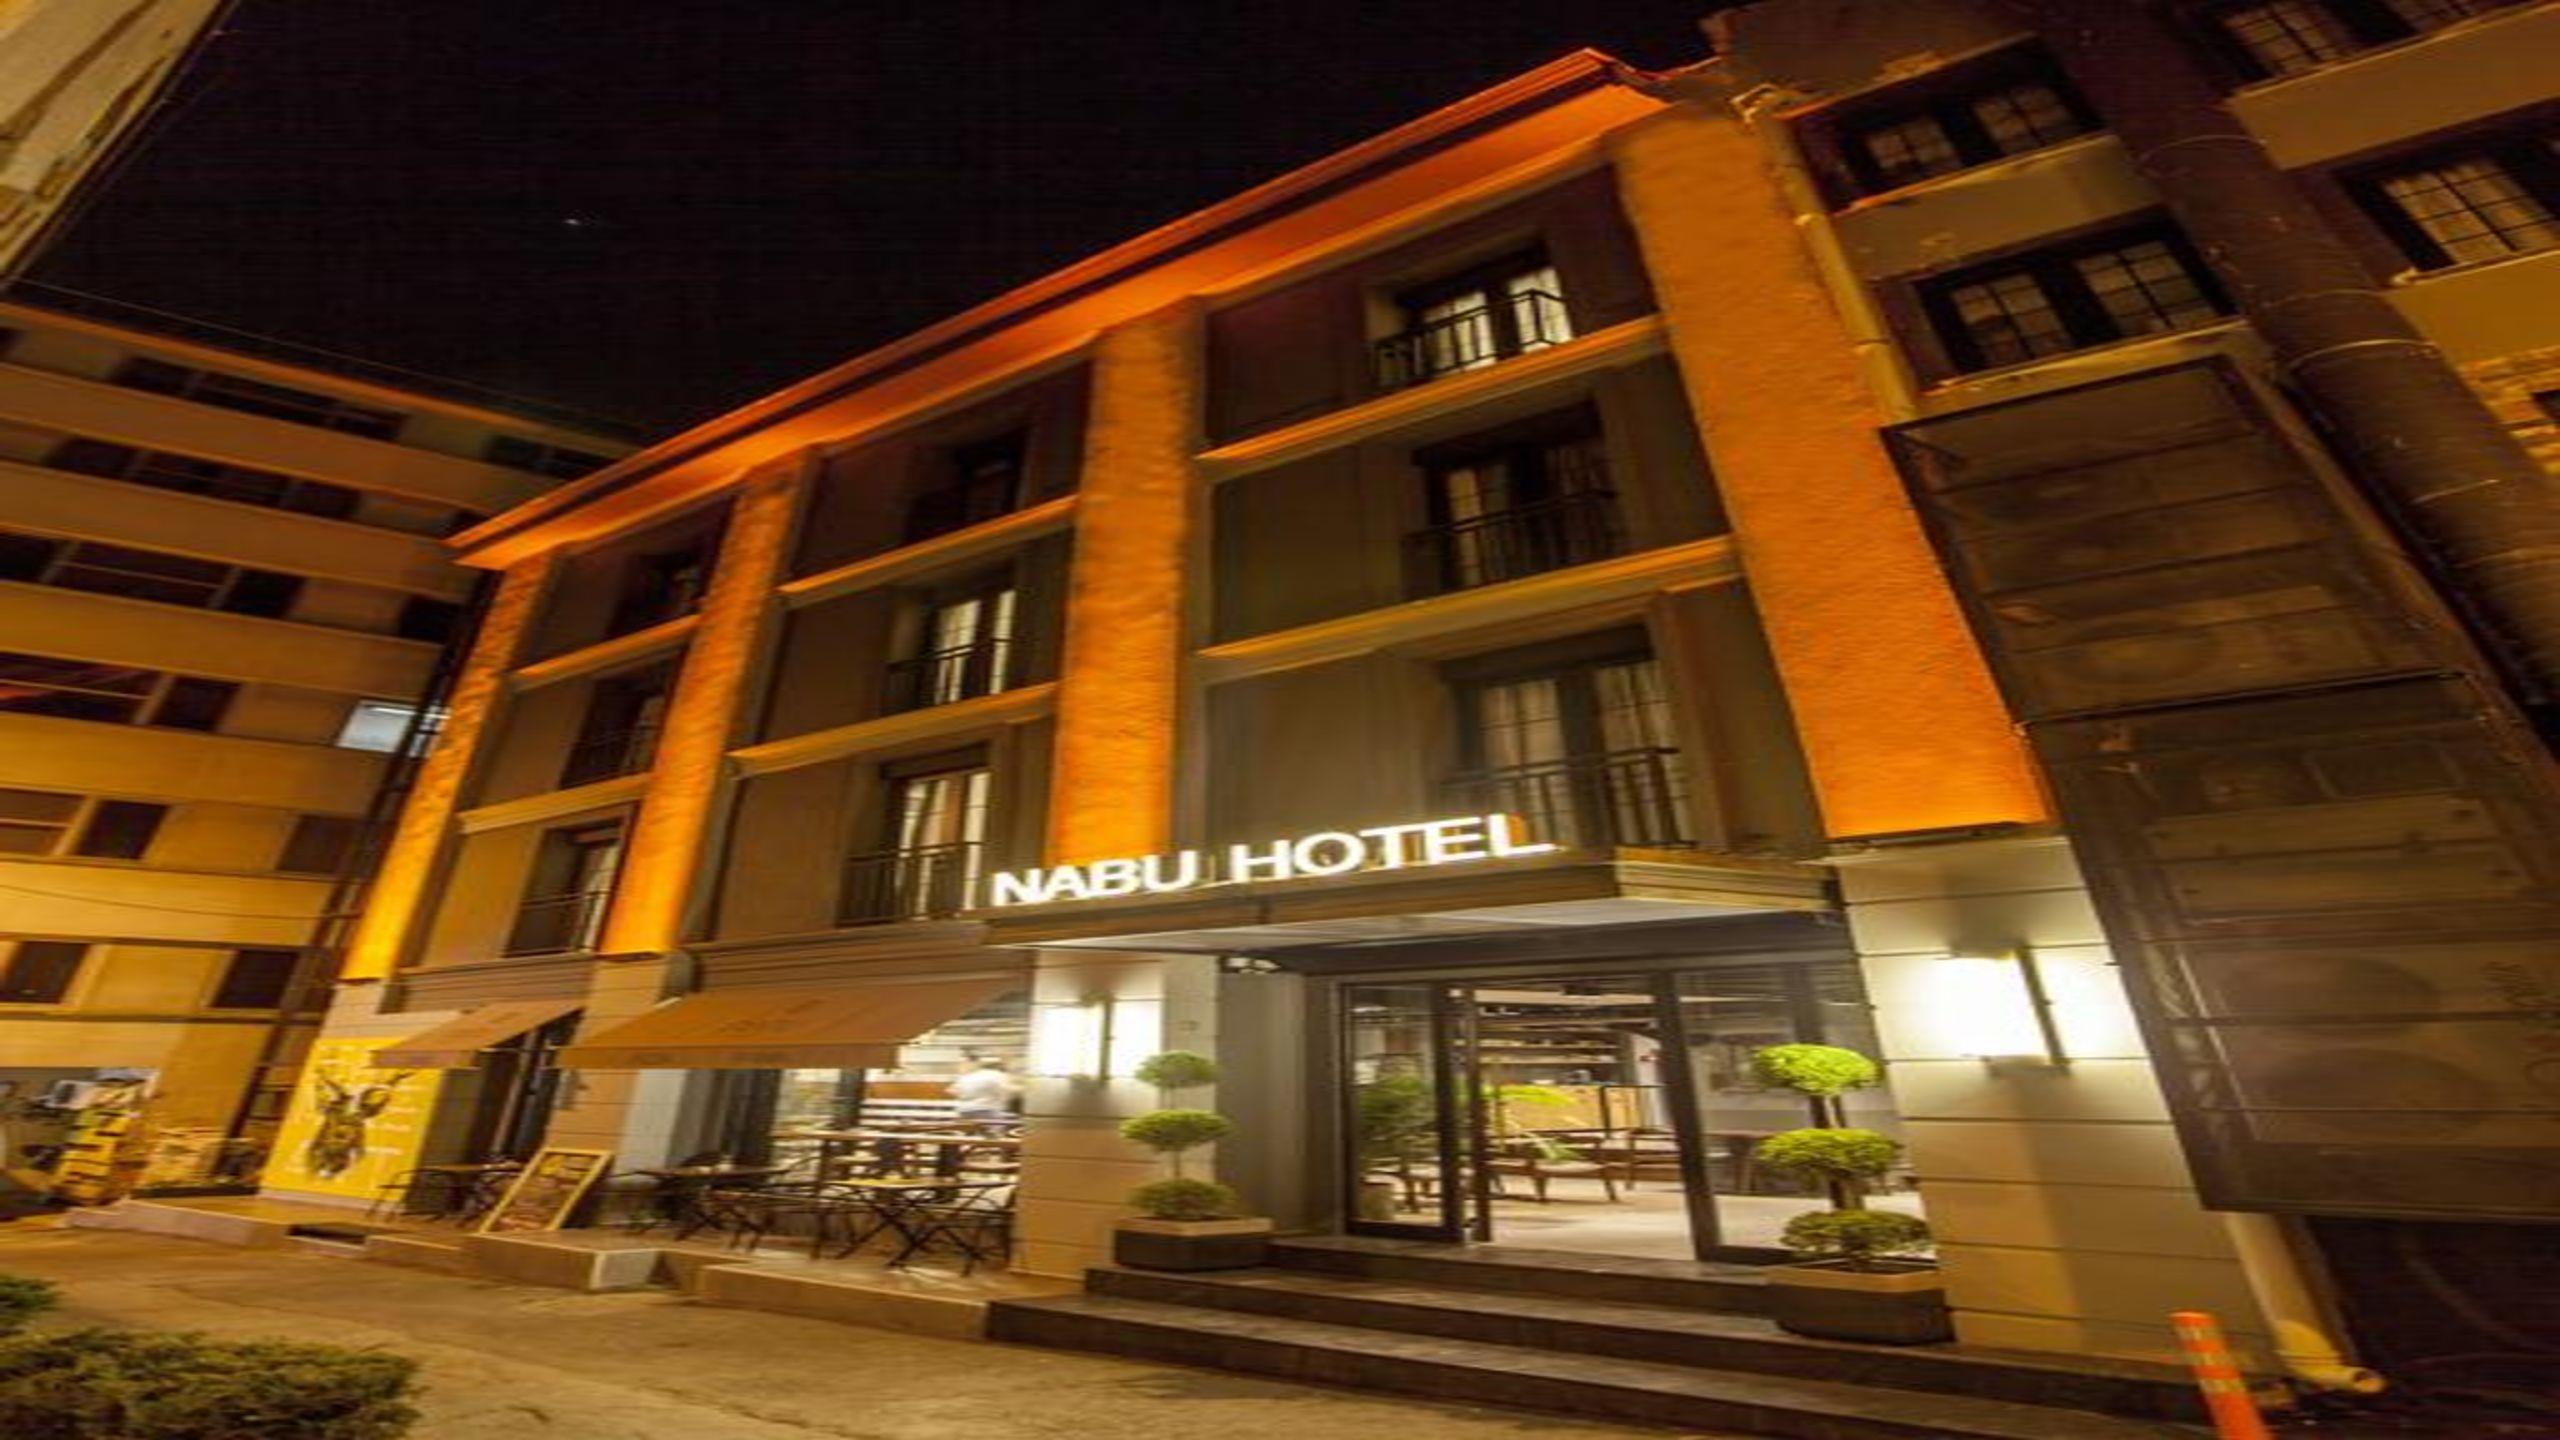 Nabu Hotel Karaköy